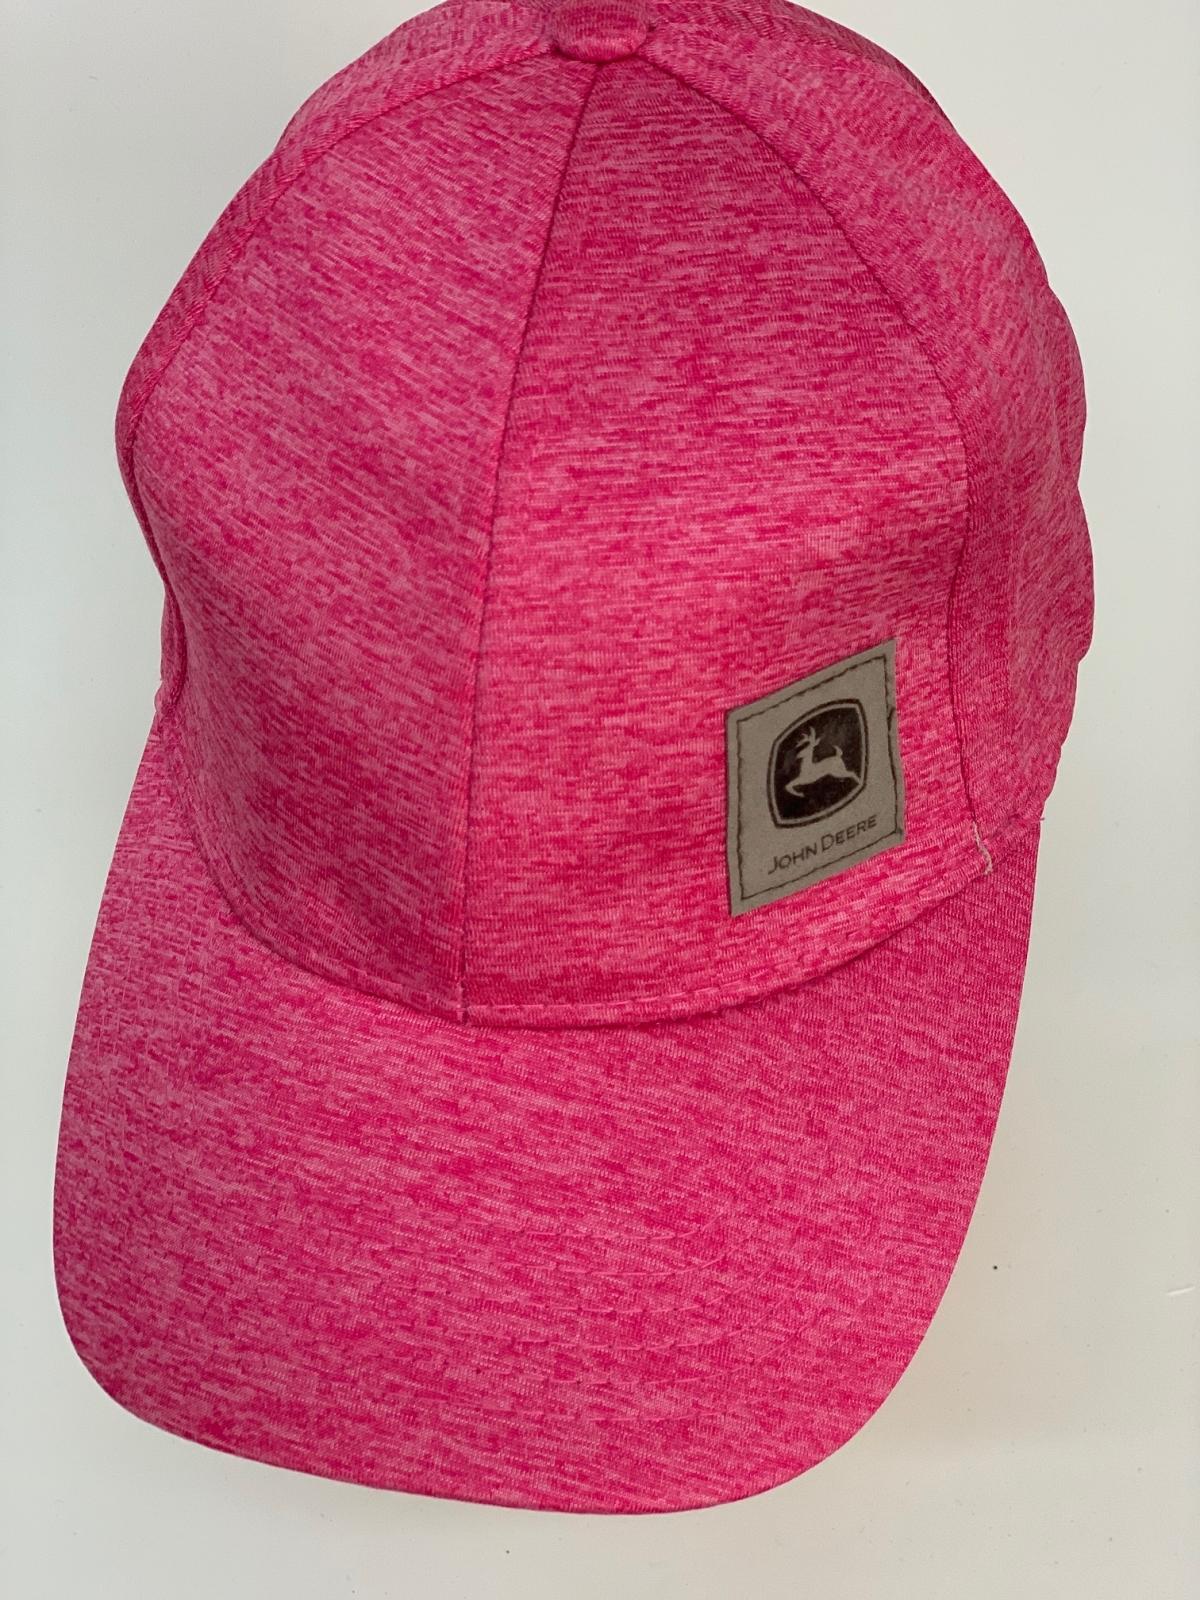 Бейсболка John Deere цвета розовый меланж